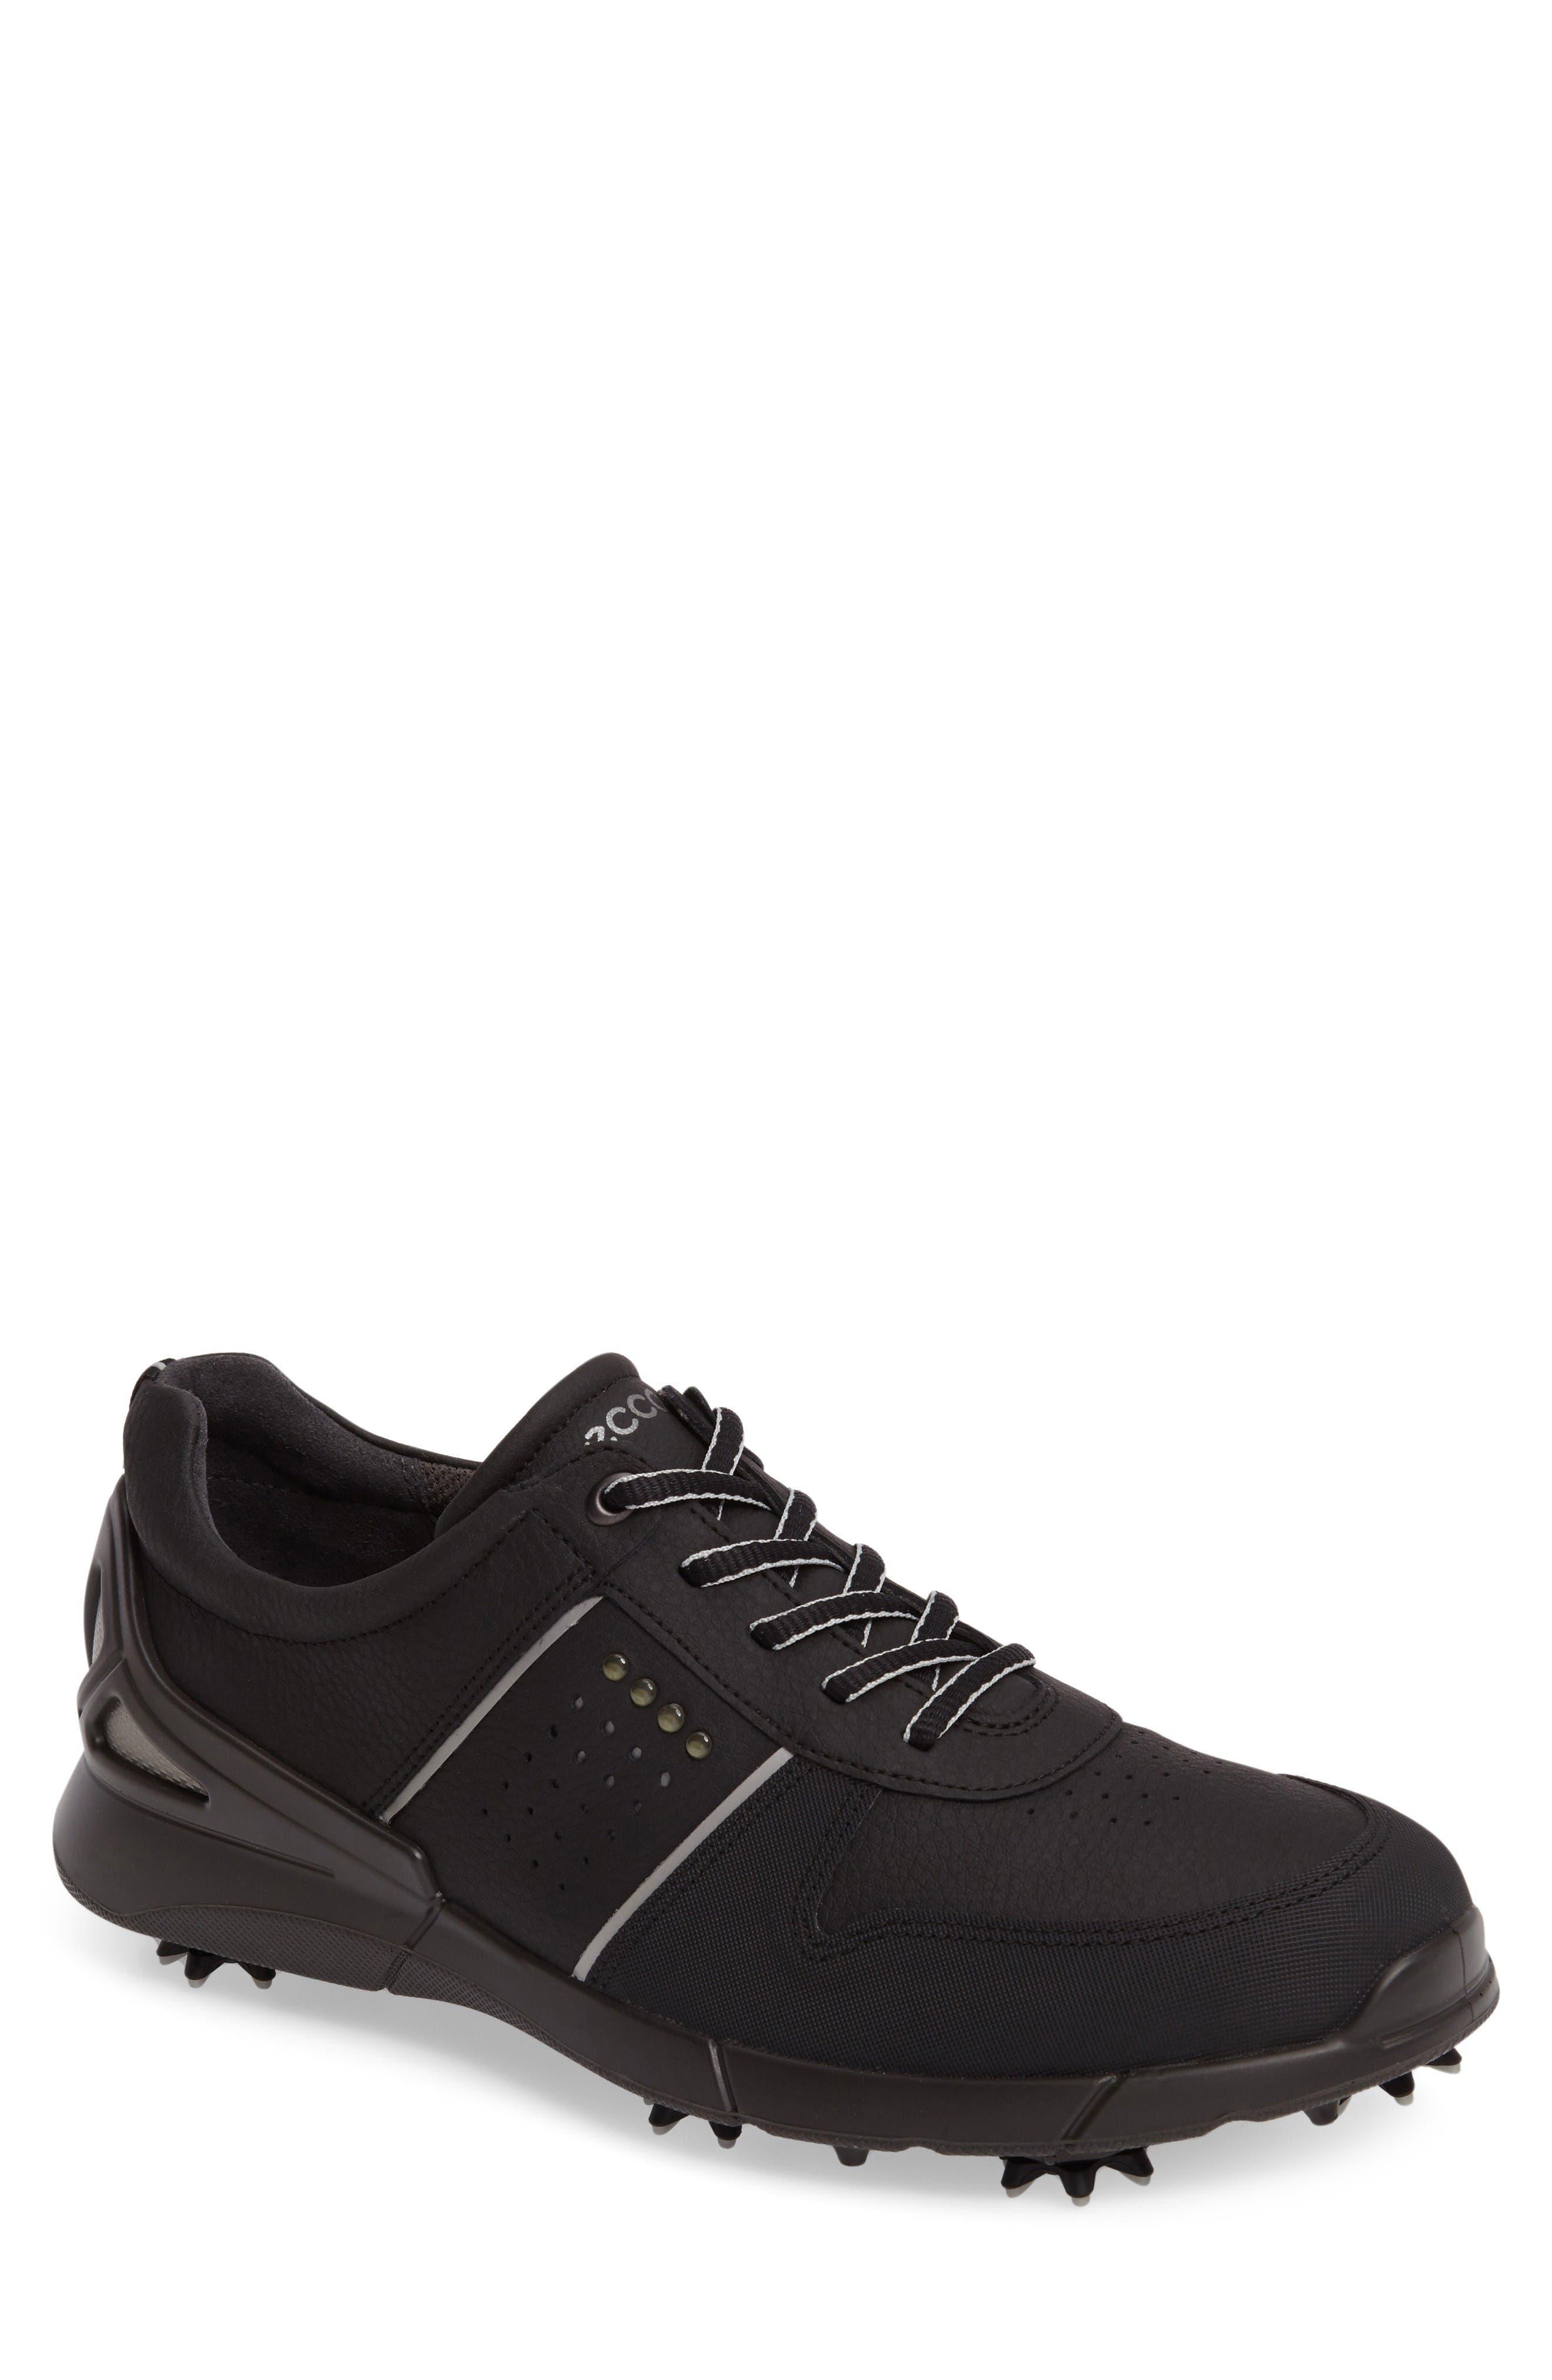 Main Image - ECCO Base One Golf Shoe (Men)